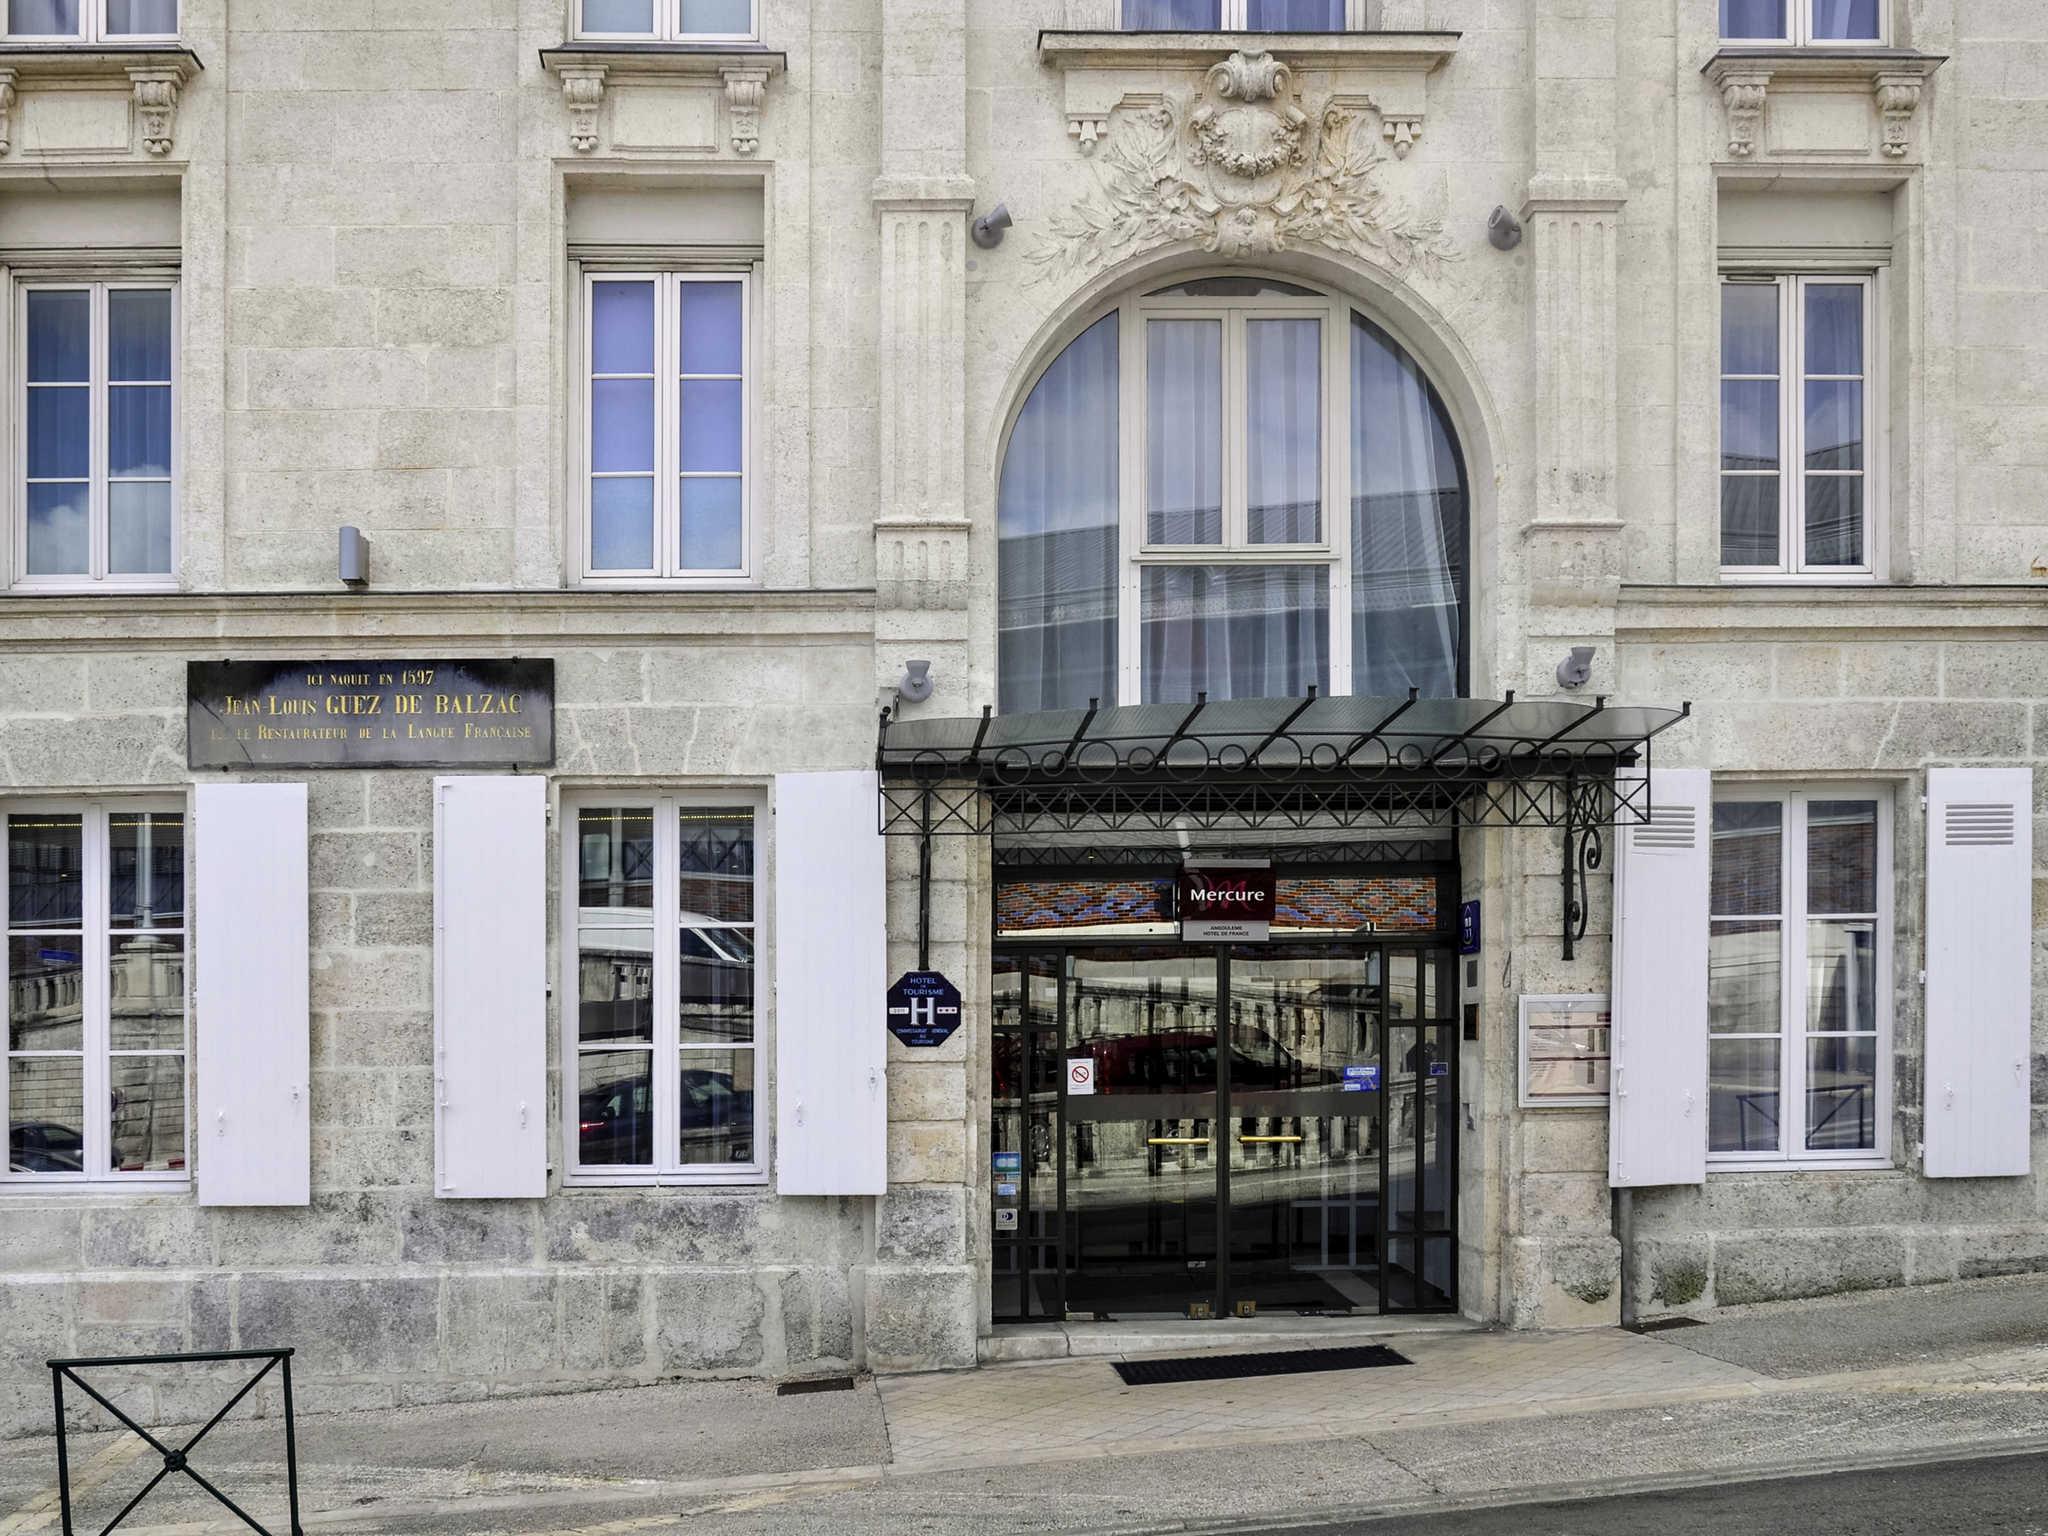 Hotel - Mercure Angouleme Hotel de France hotel